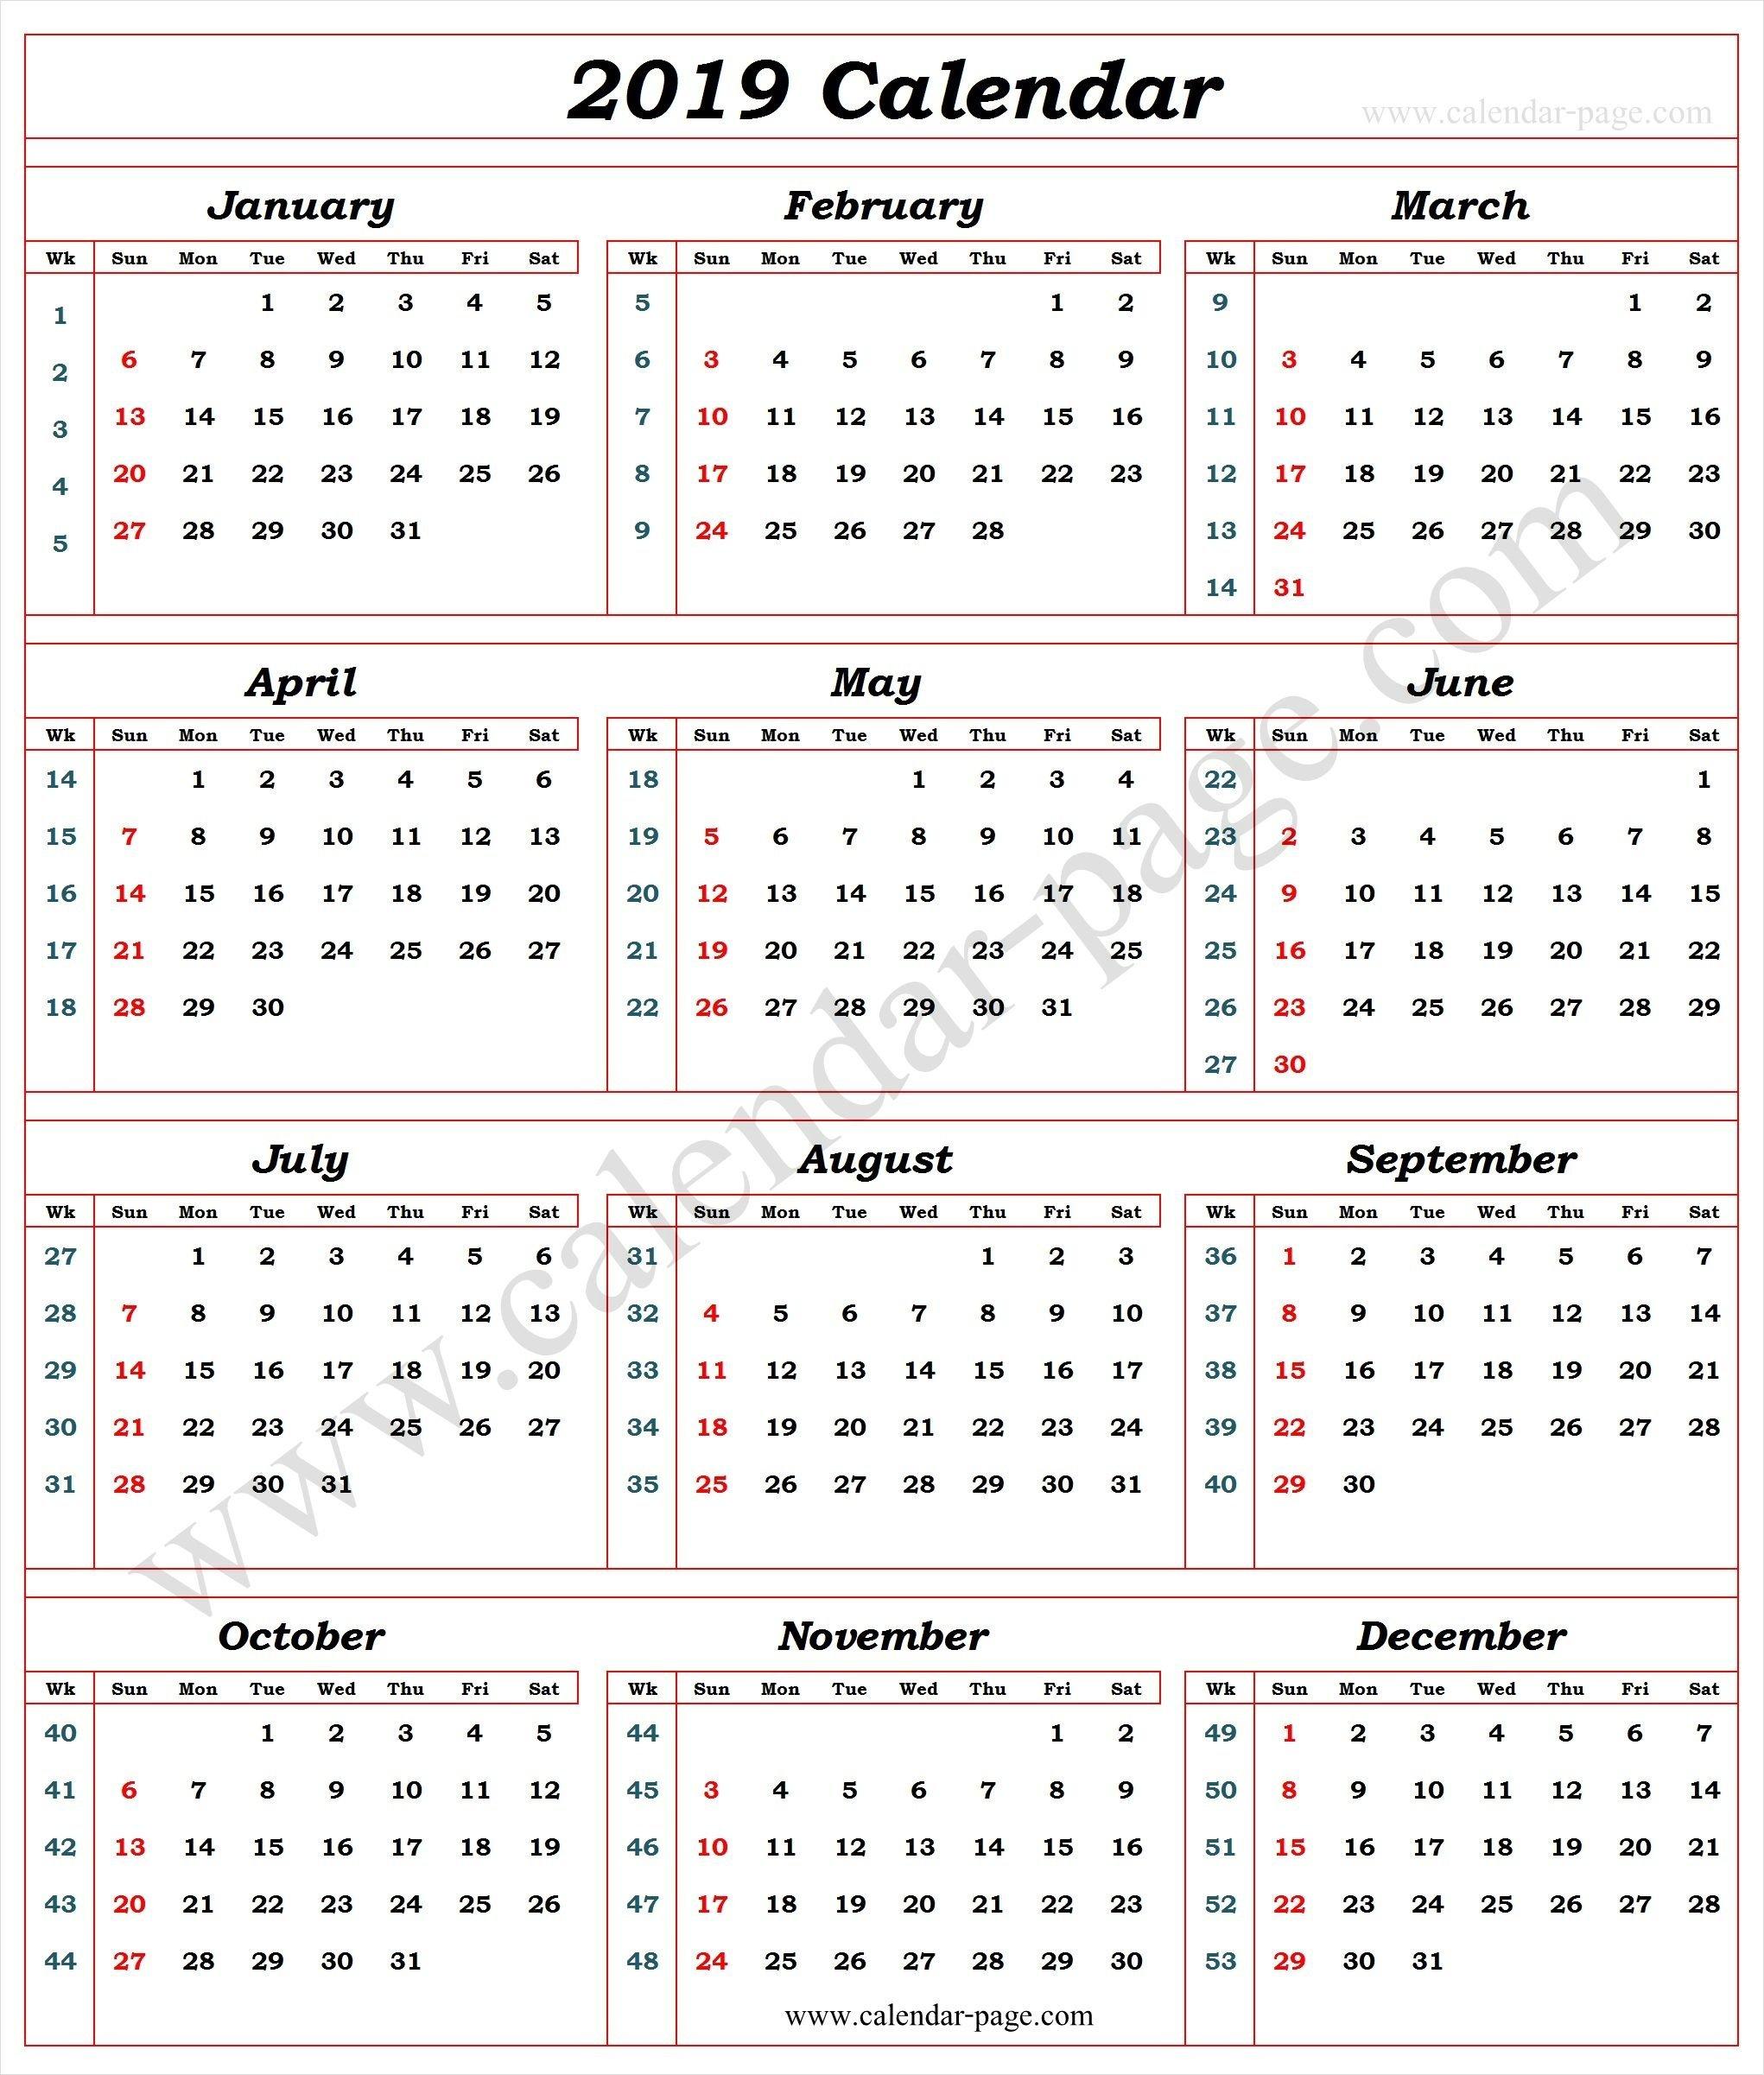 Calendar 2019 With Week Numbers | 2019 Calendar Template | Calendar Week 6 Calendar 2019